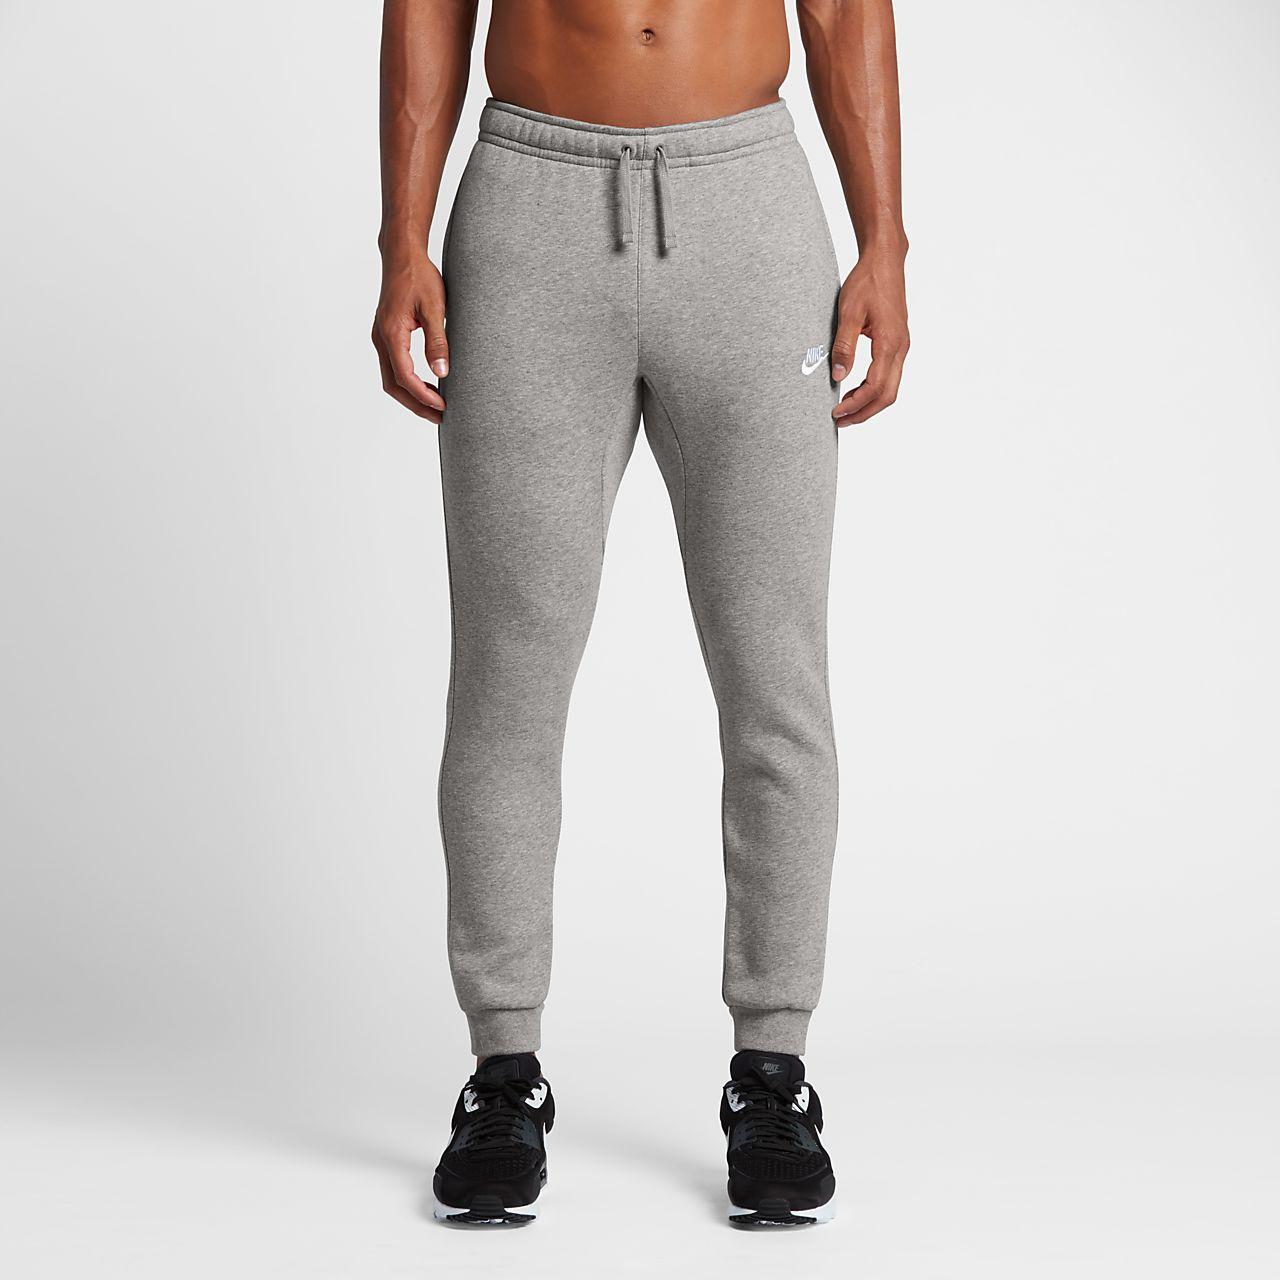 96e3c08b62f455 Nike Sportswear Club Fleece Men's Joggers. Nike.com AE